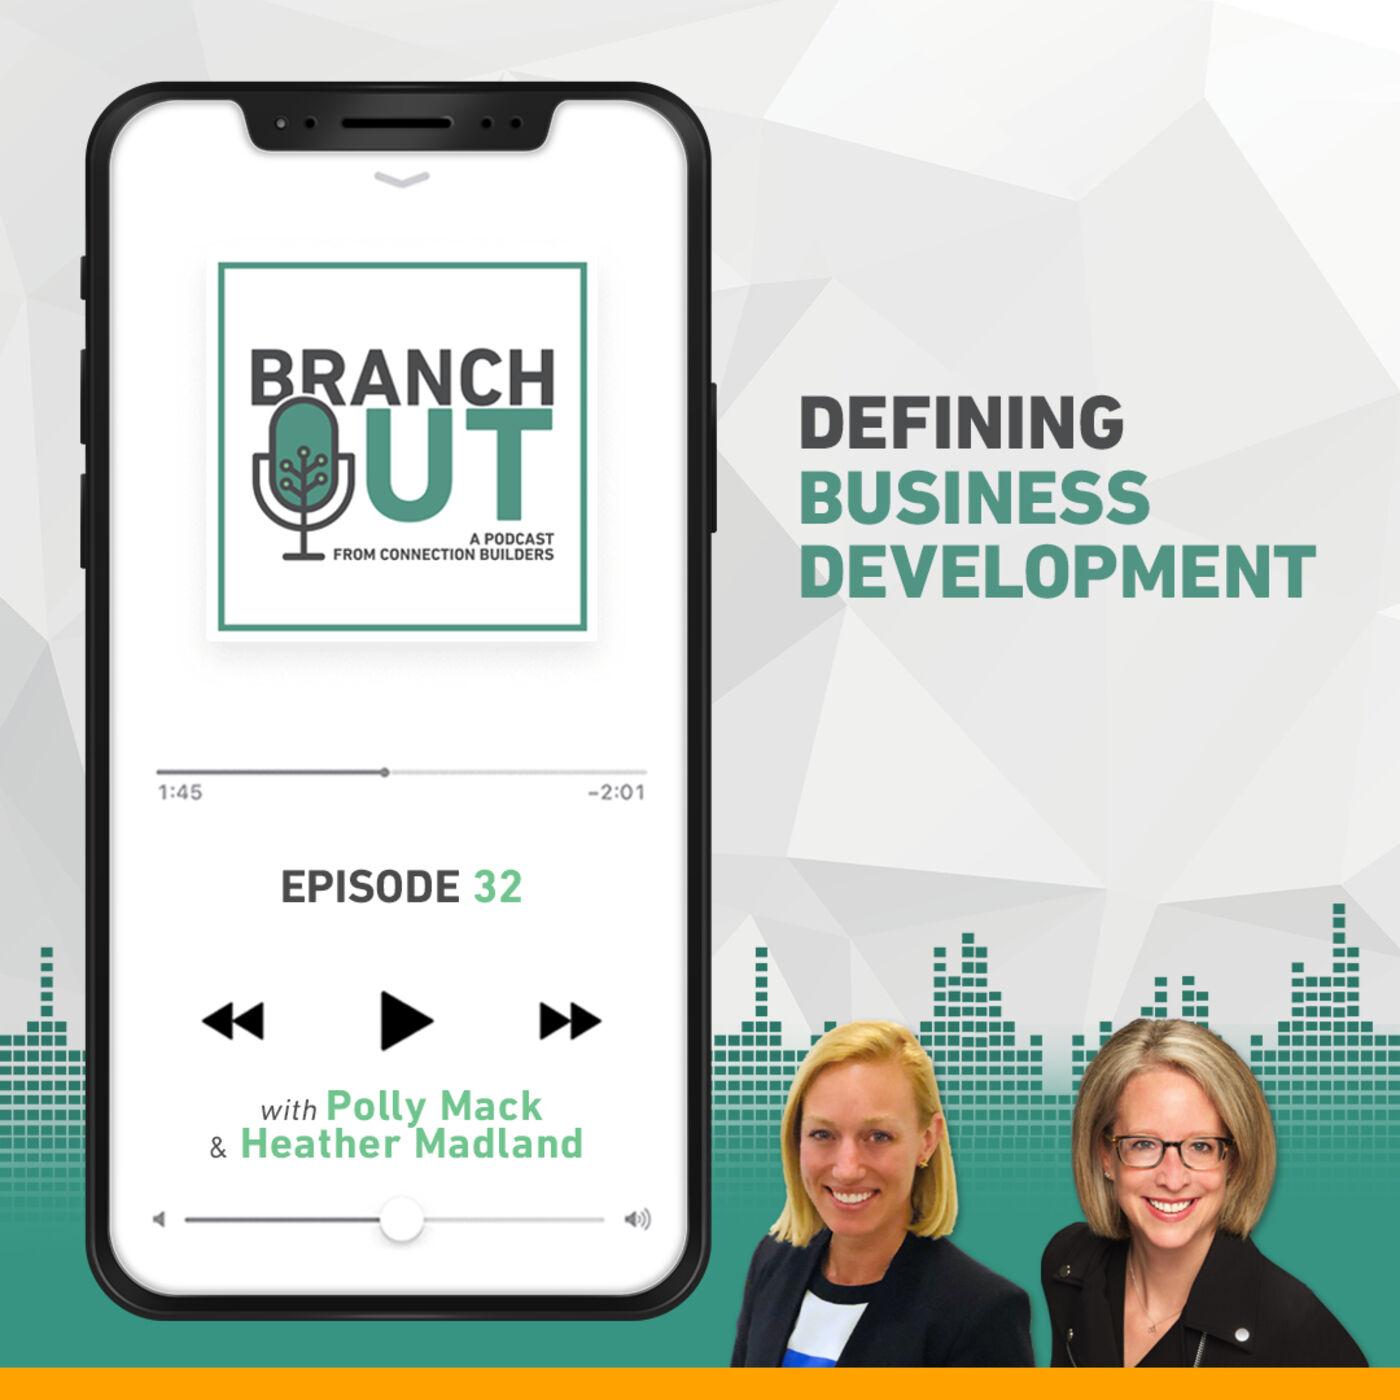 Defining Business Development - Polly Mack & Heather Madland